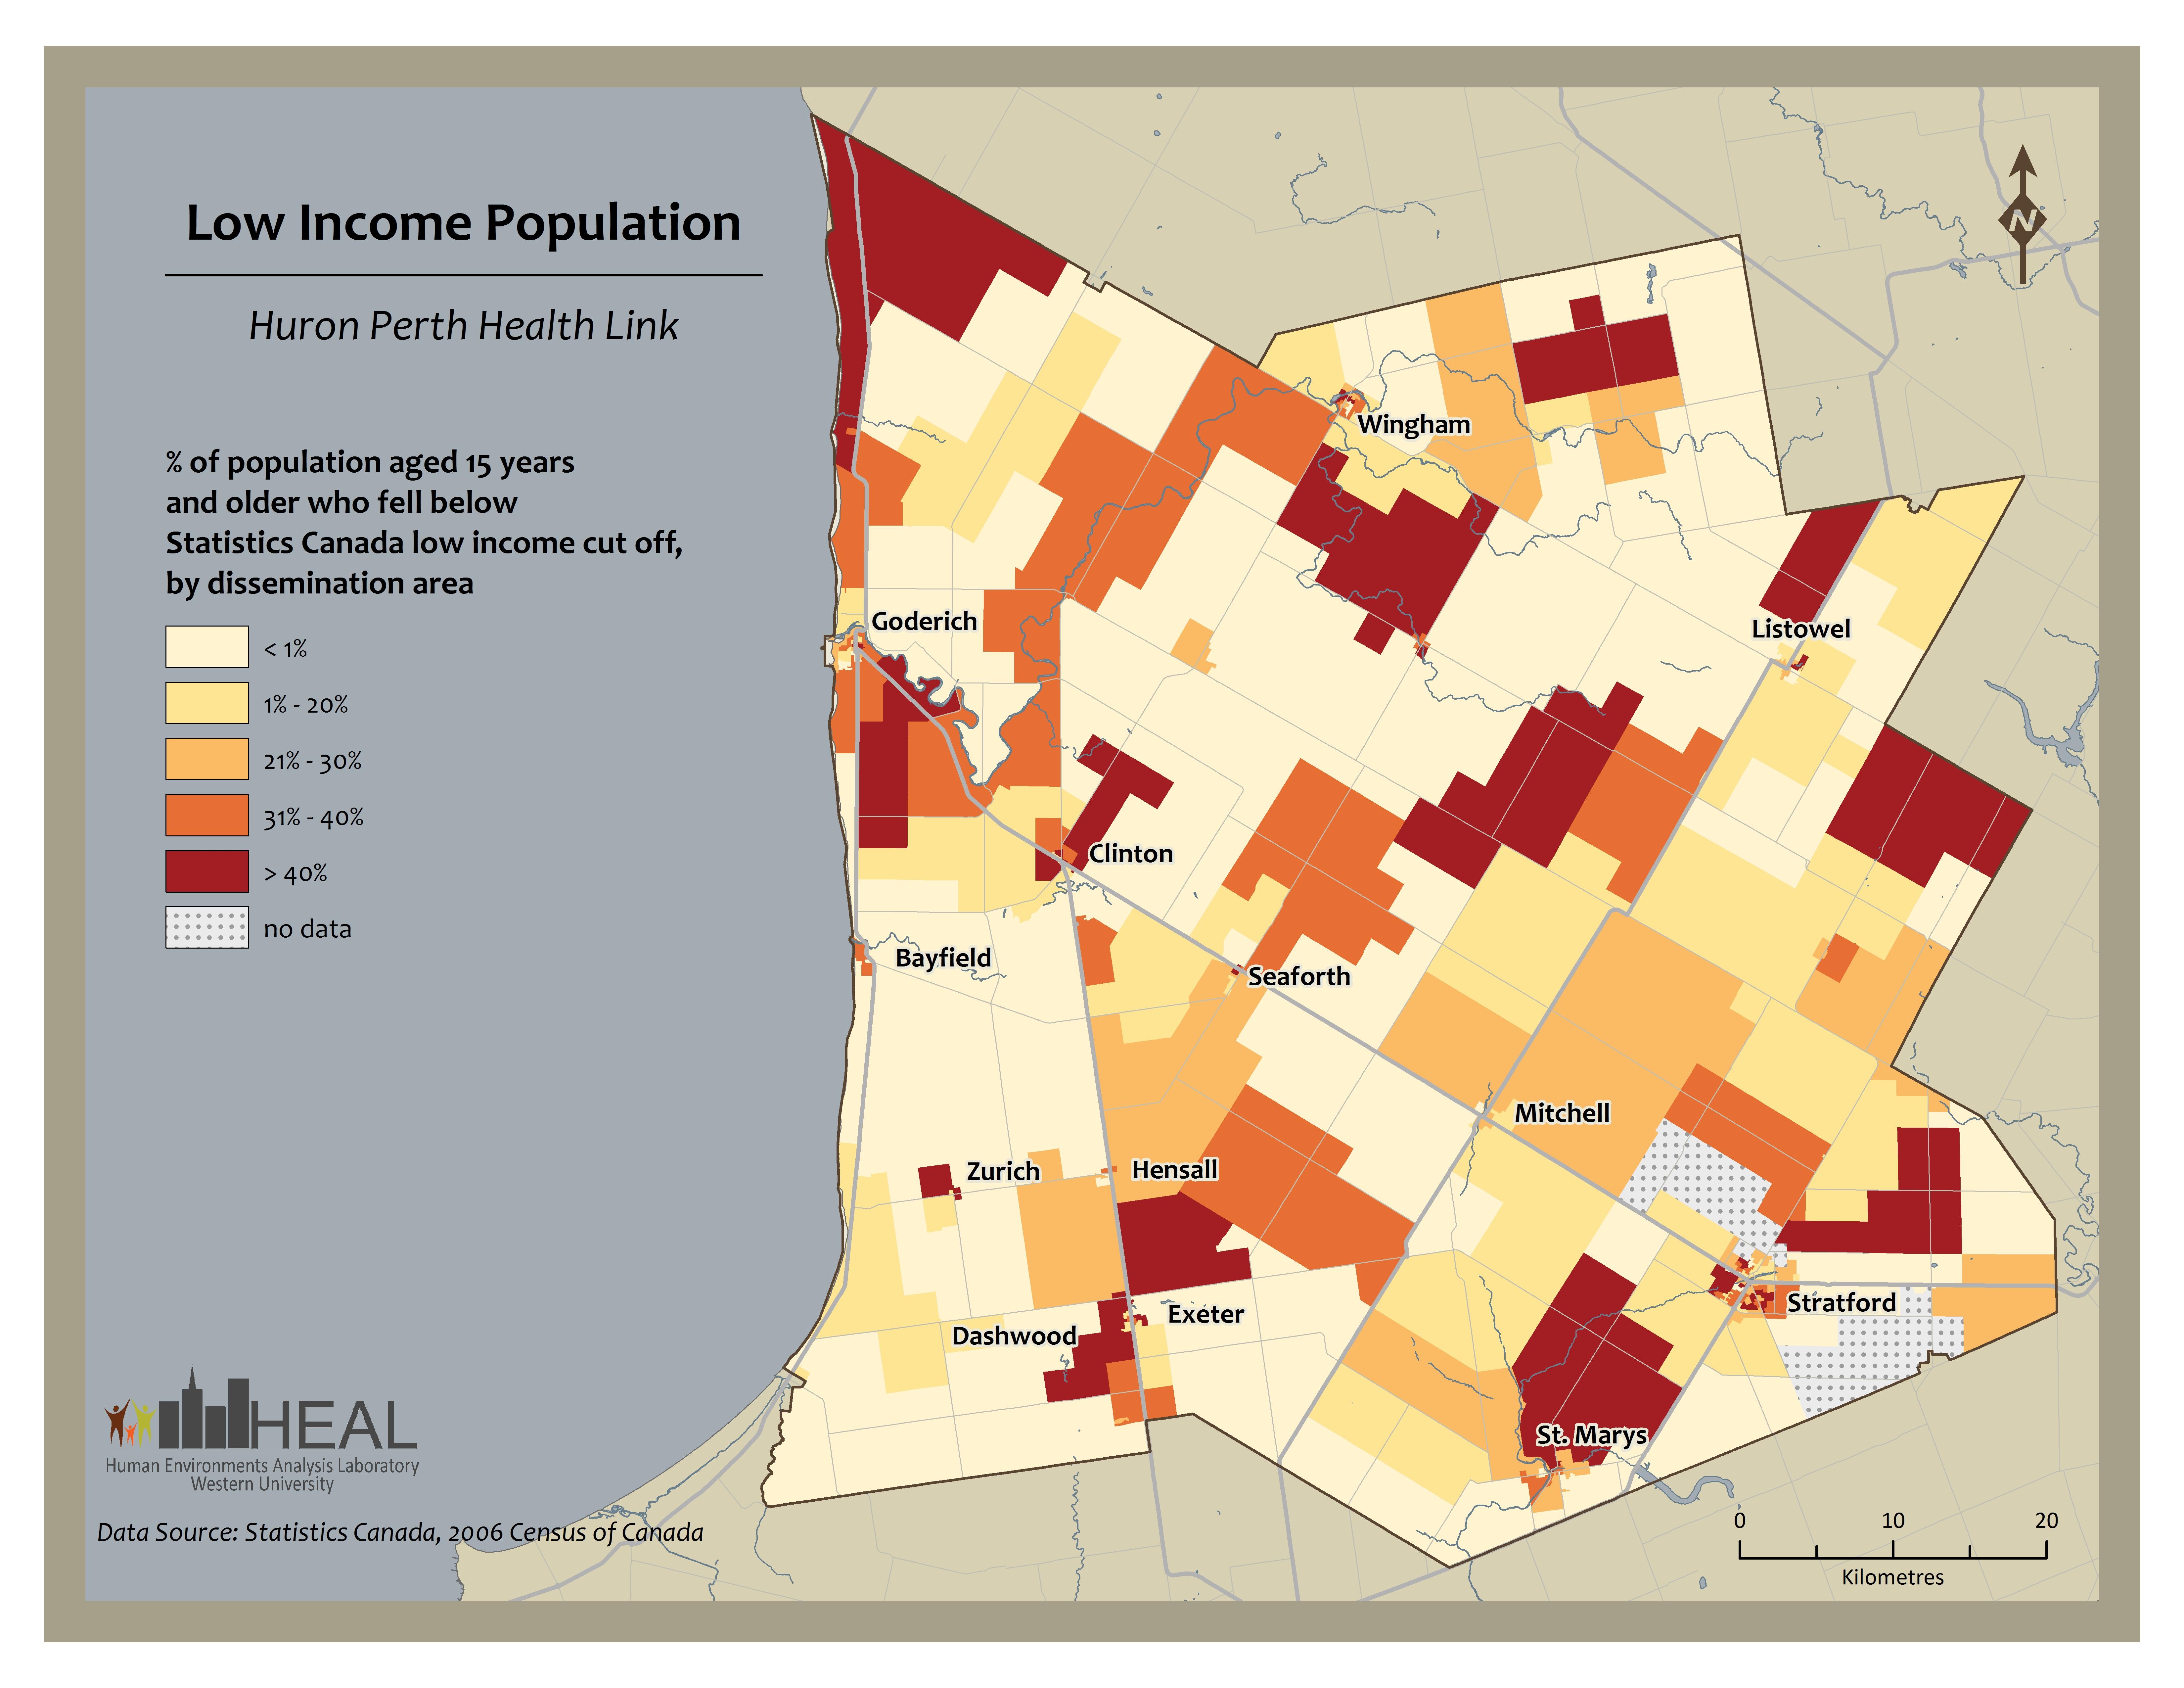 Understanding health inequities and access to primary care in the understanding health inequities and access to primary care in the south west lhin malvernweather Choice Image